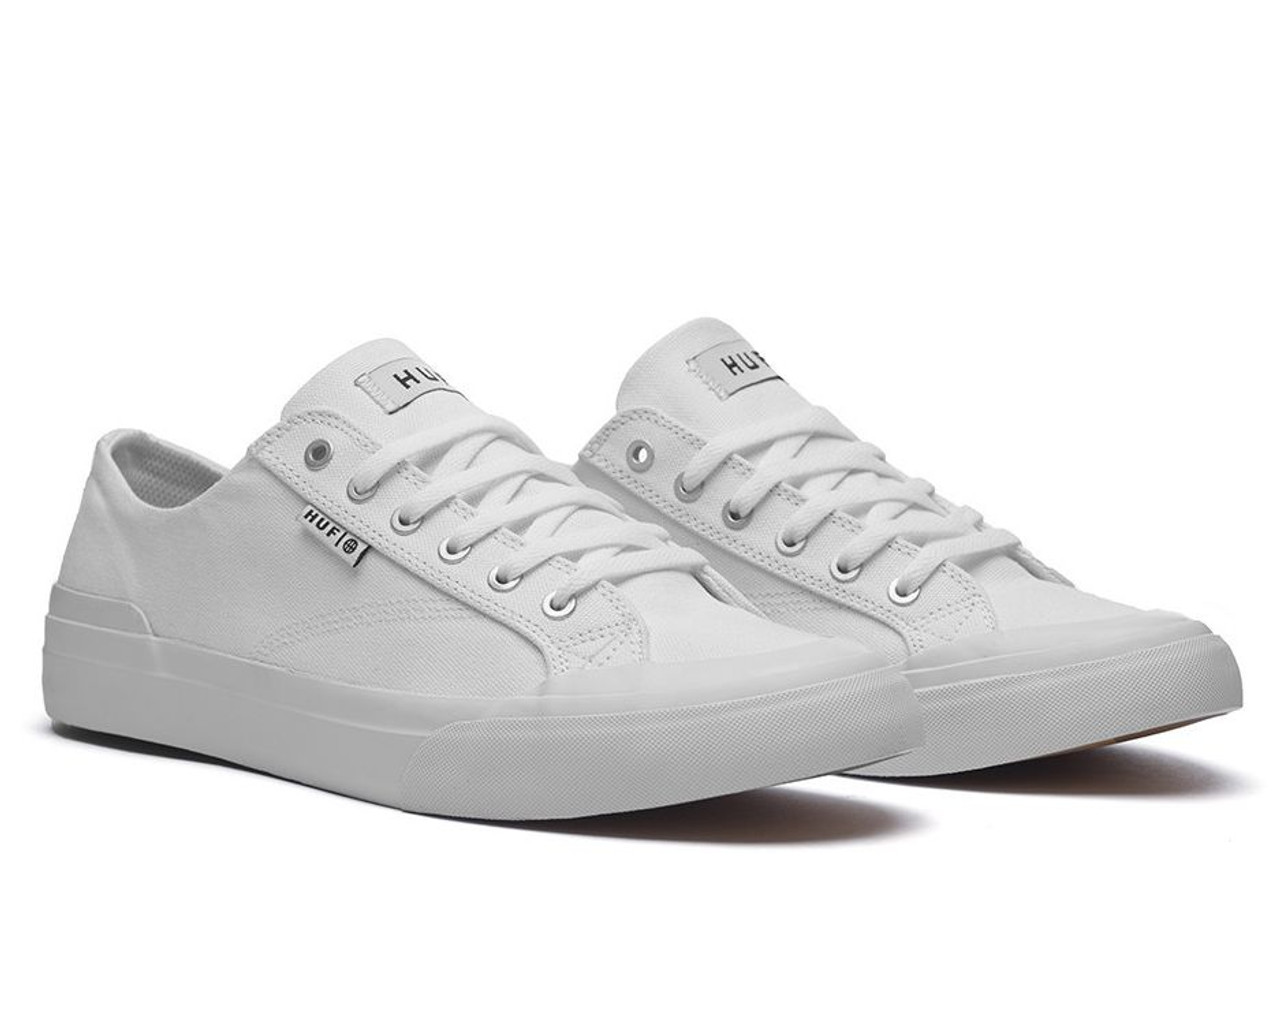 ff79fb59029c HUF Classic Lo ESS TX vegan skate shoe